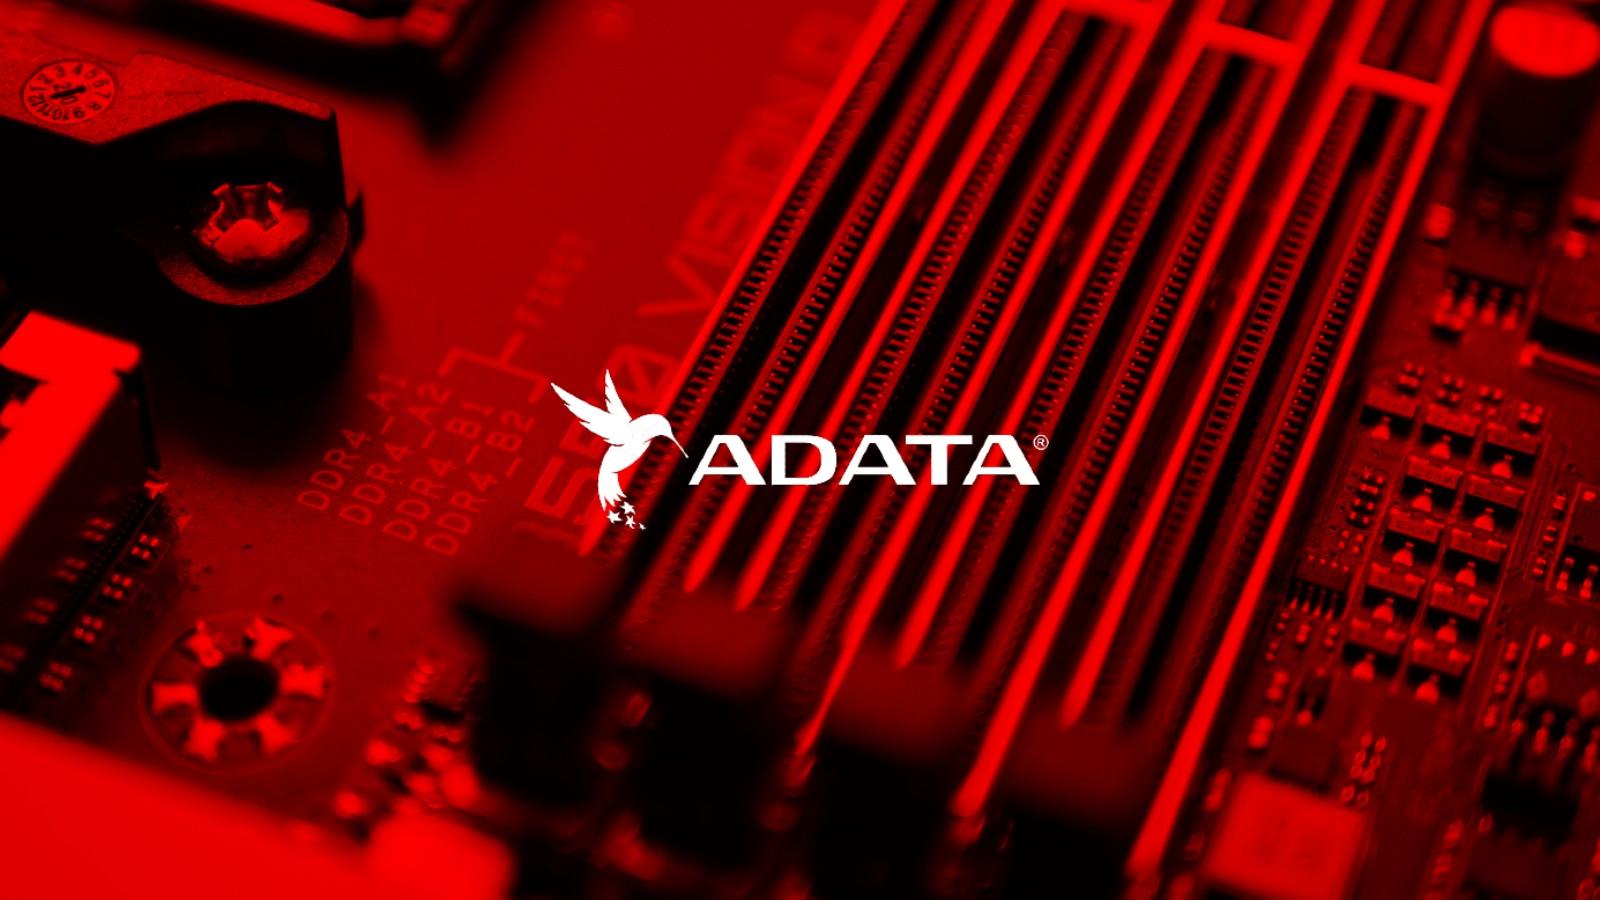 Computer Memory Maker ADATA Hit By Ragnar Locker Ransomware